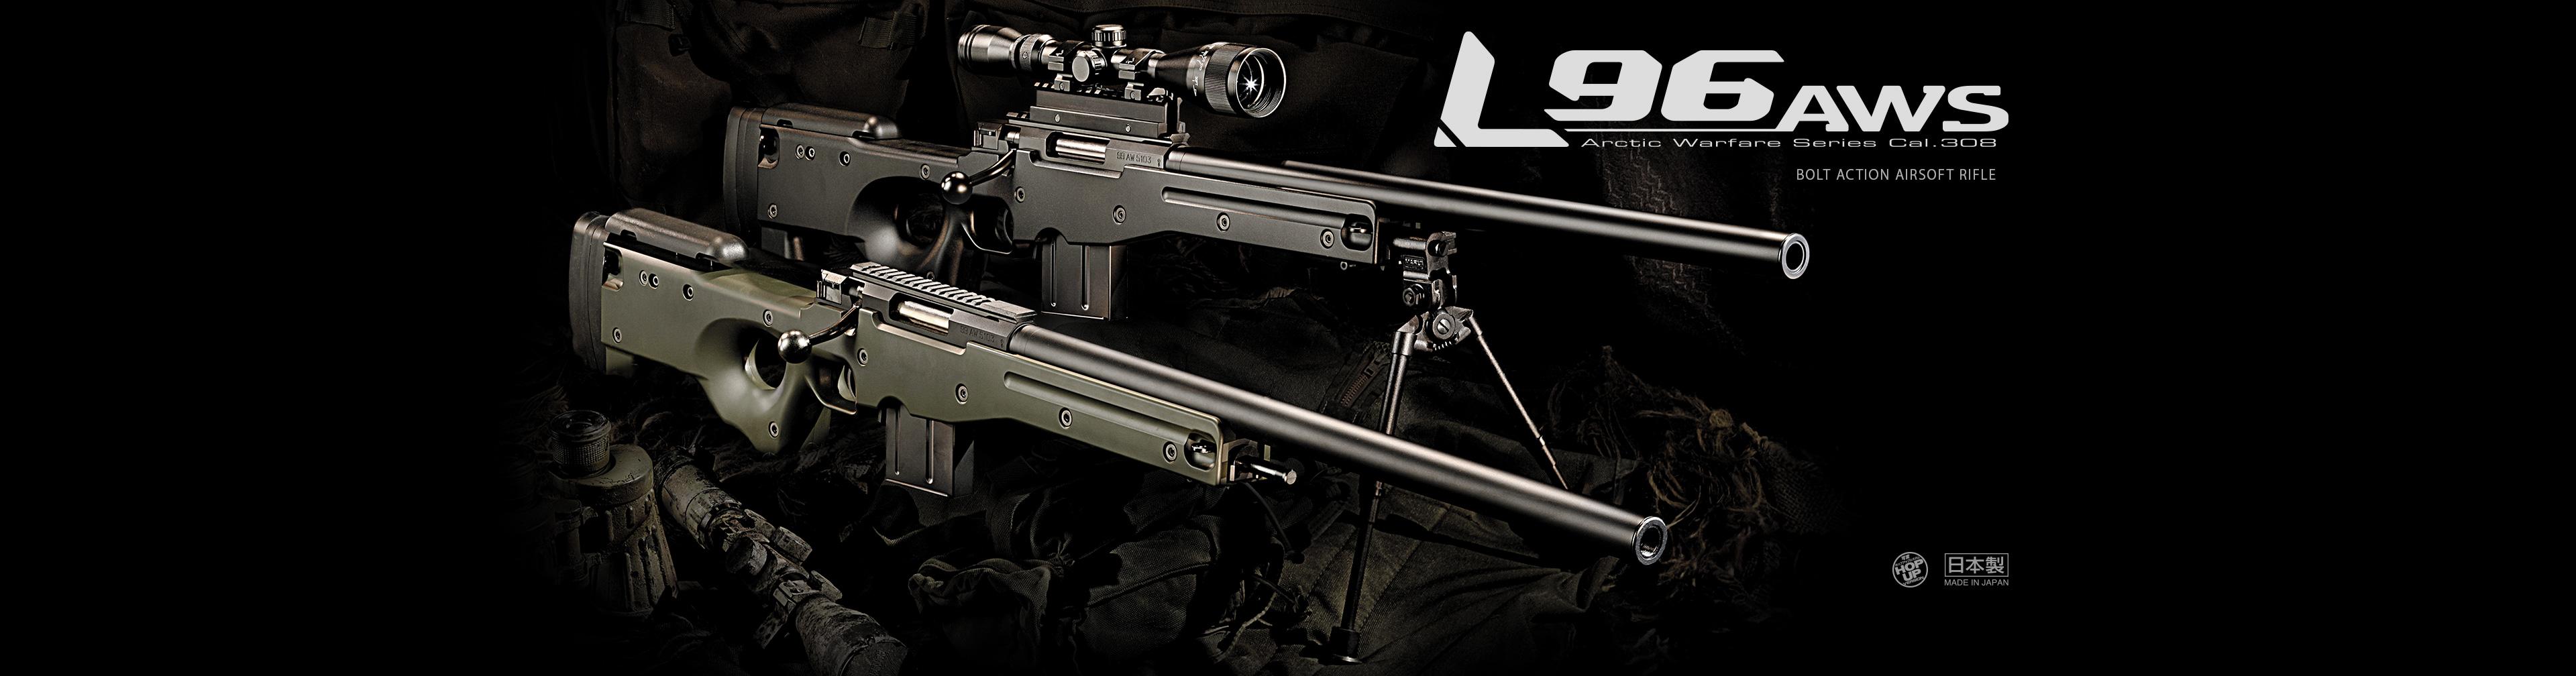 L96 AWS ブラックストック